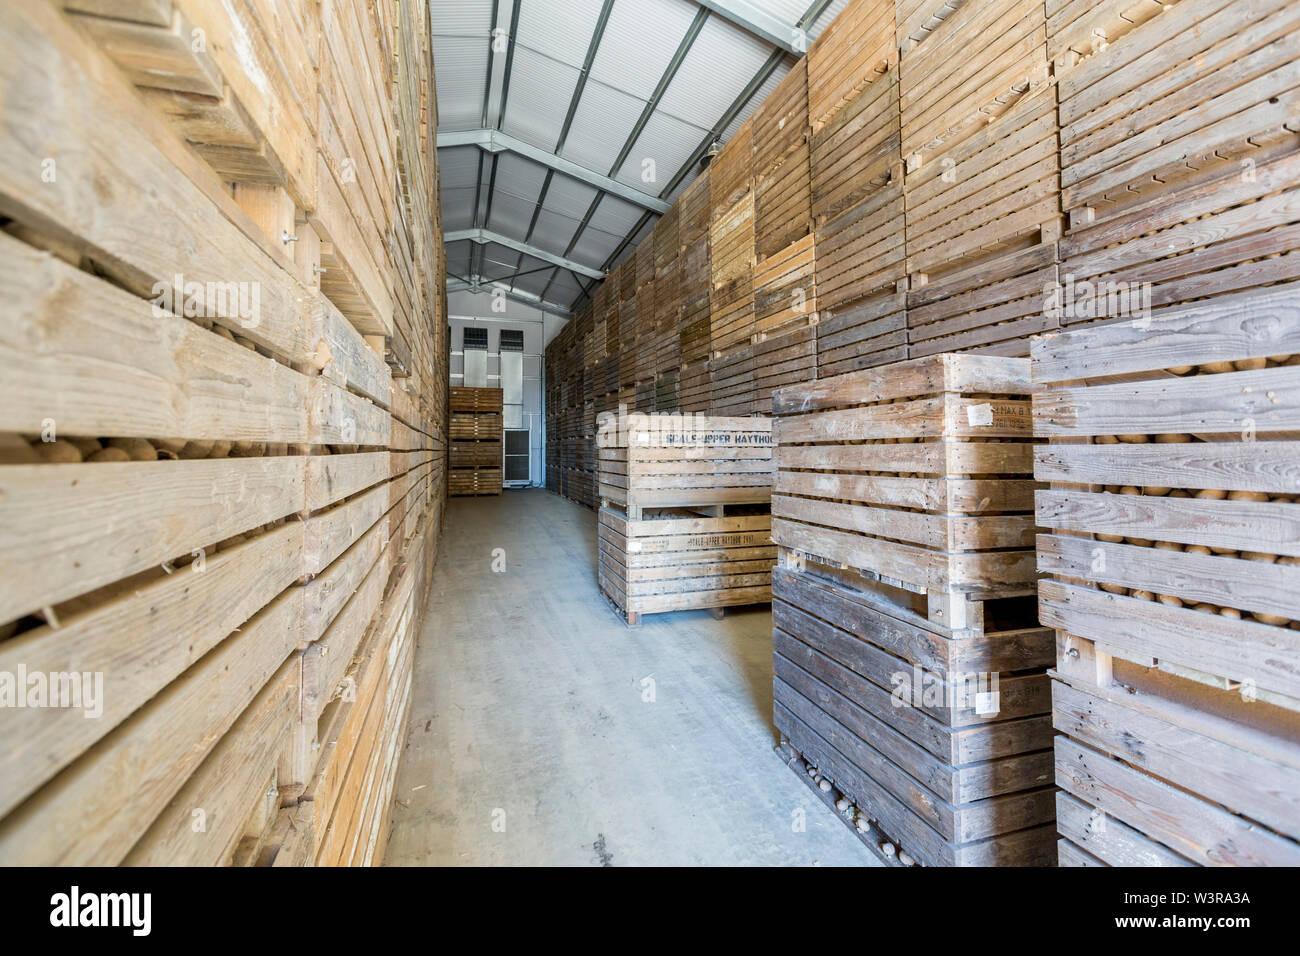 Potato storage crates inside a chilled storage barn, Pembrokeshire.  ©James Davies Photography - Stock Image